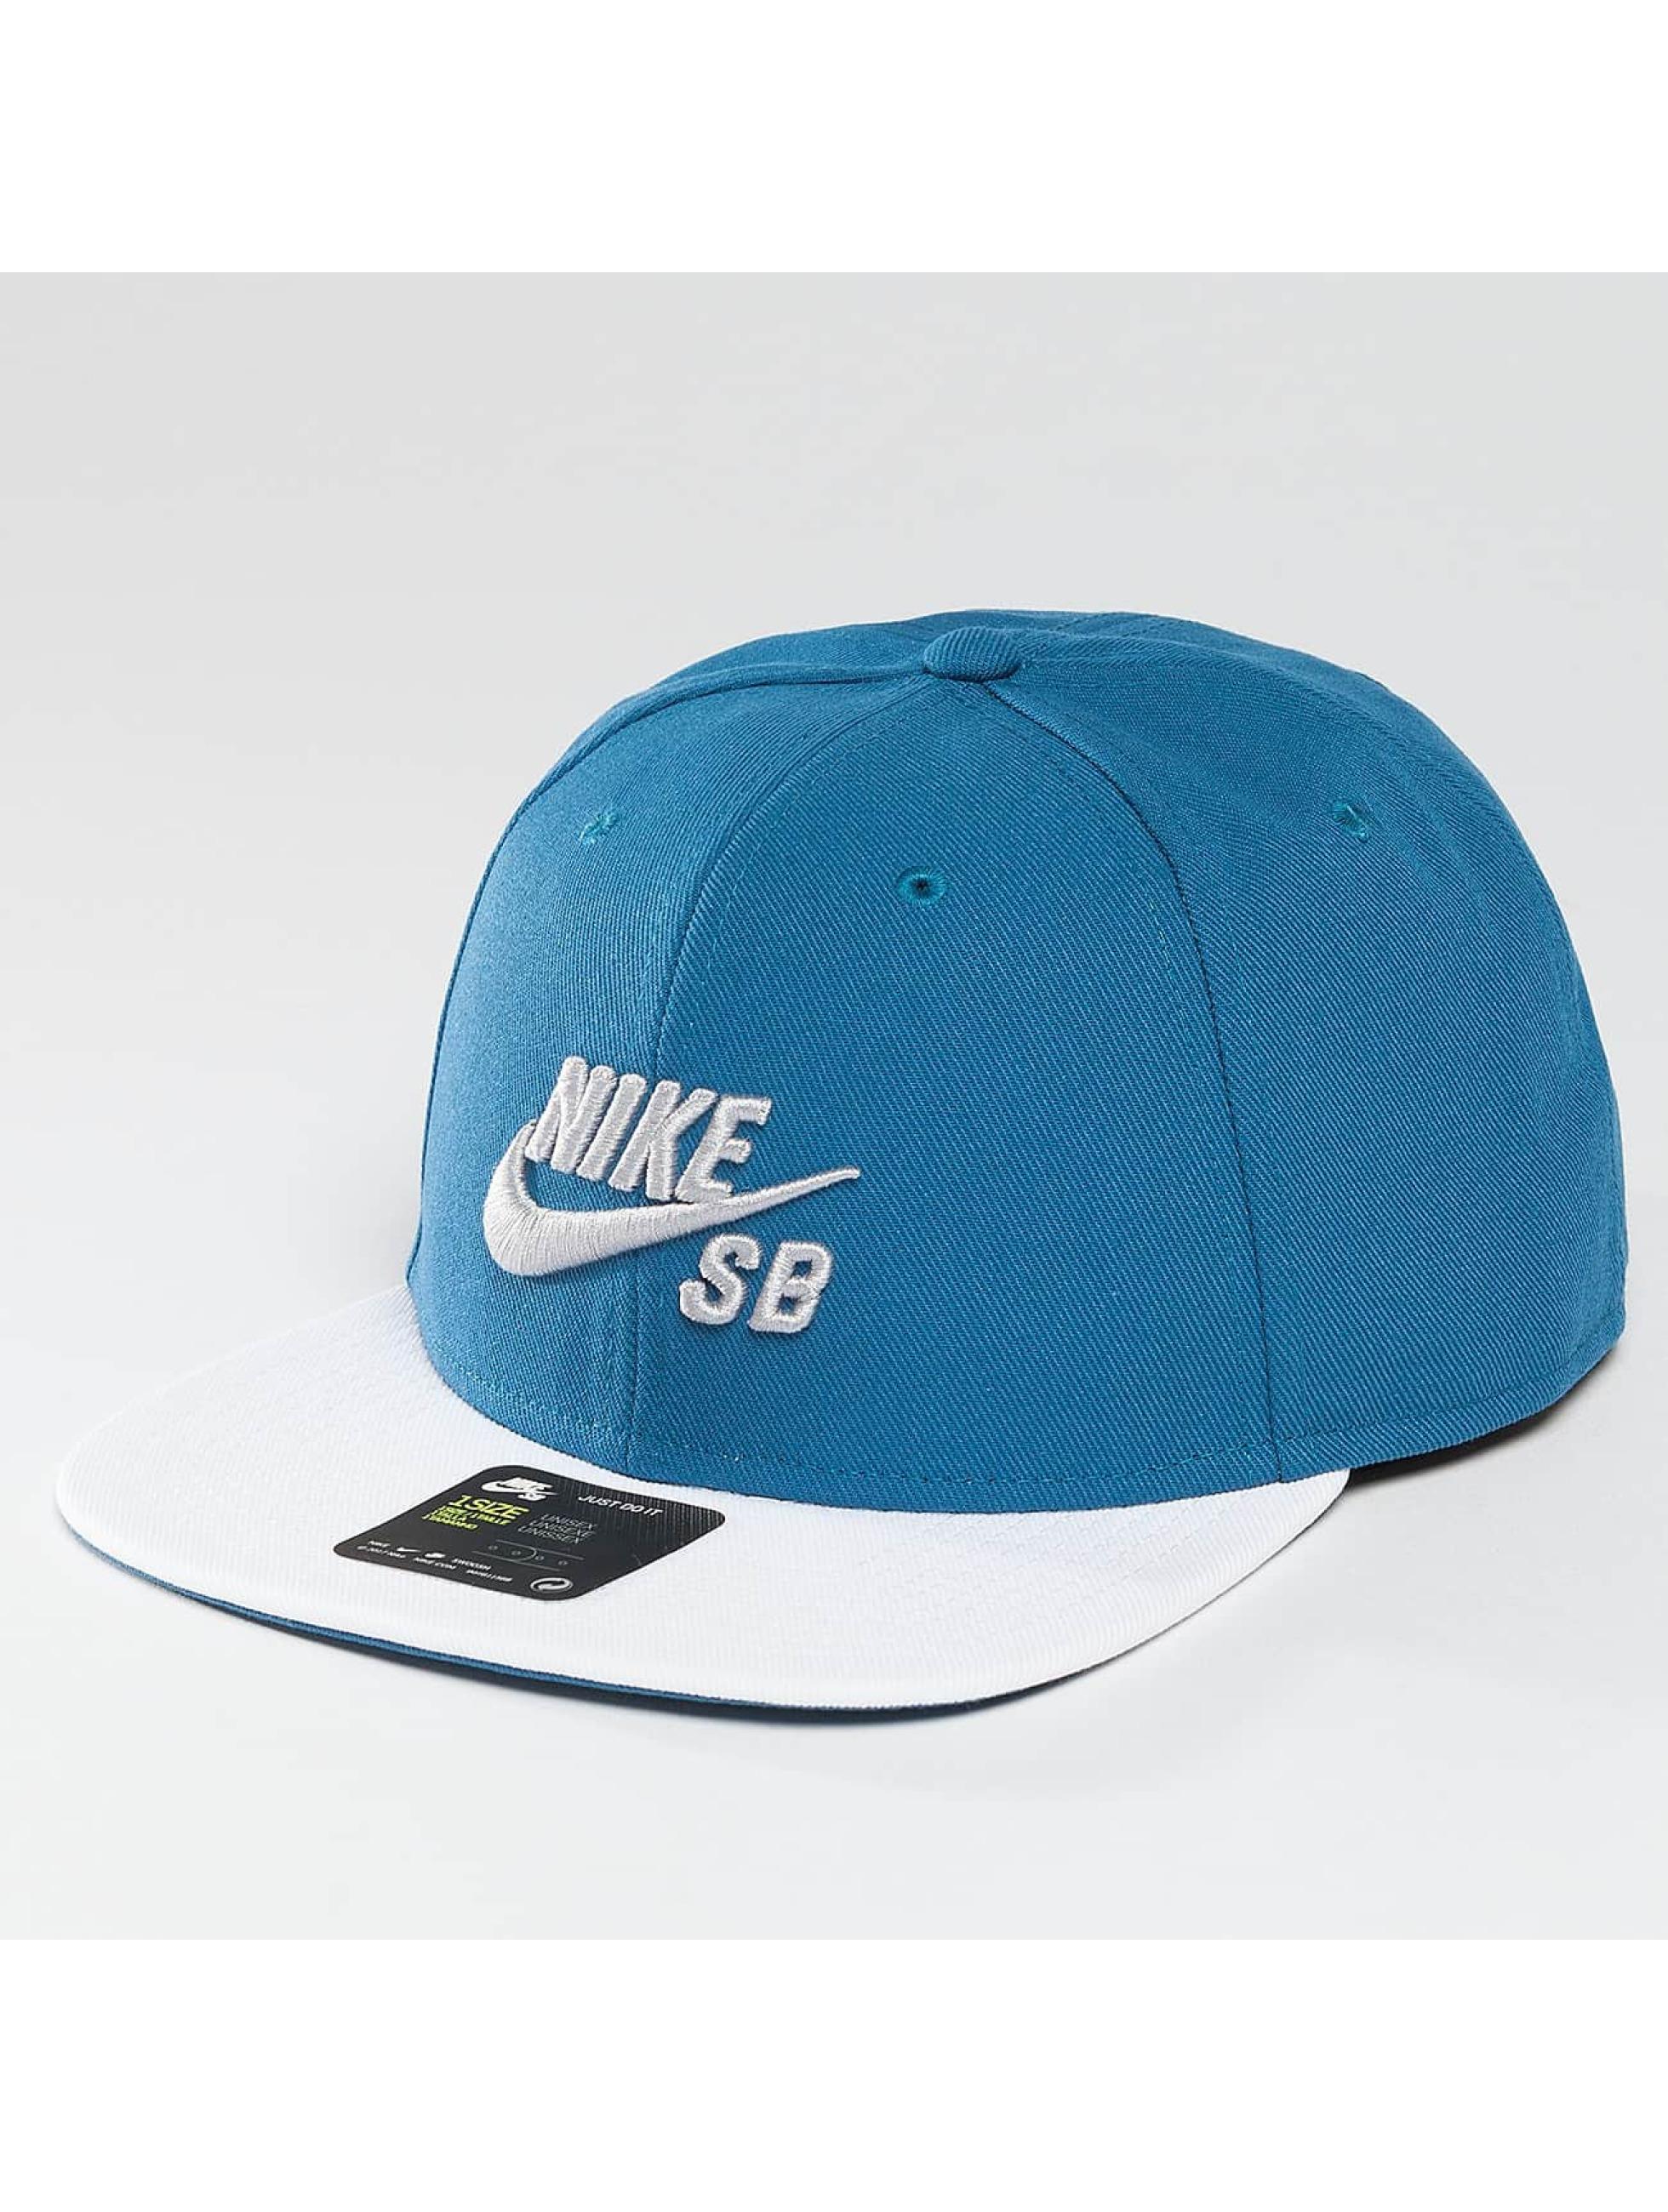 Nike SB Männer Snapback Cap Icon in blau